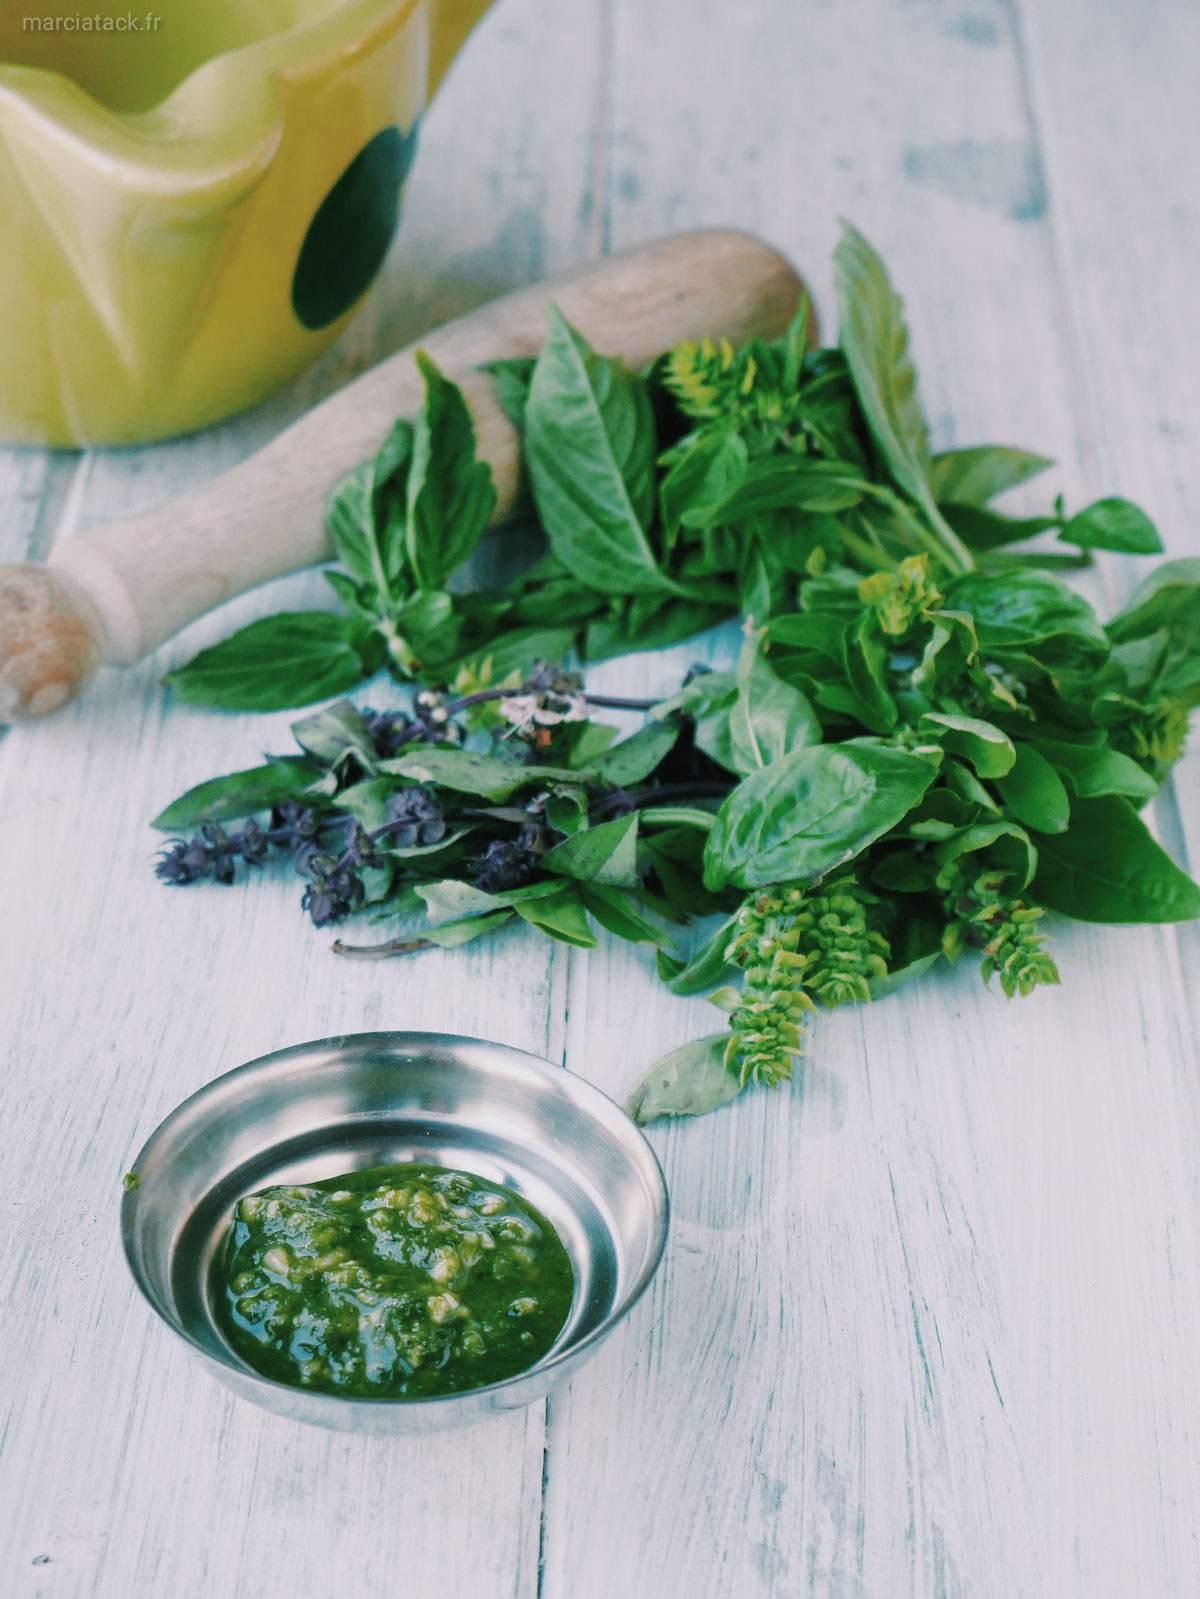 pesto de basilic frais